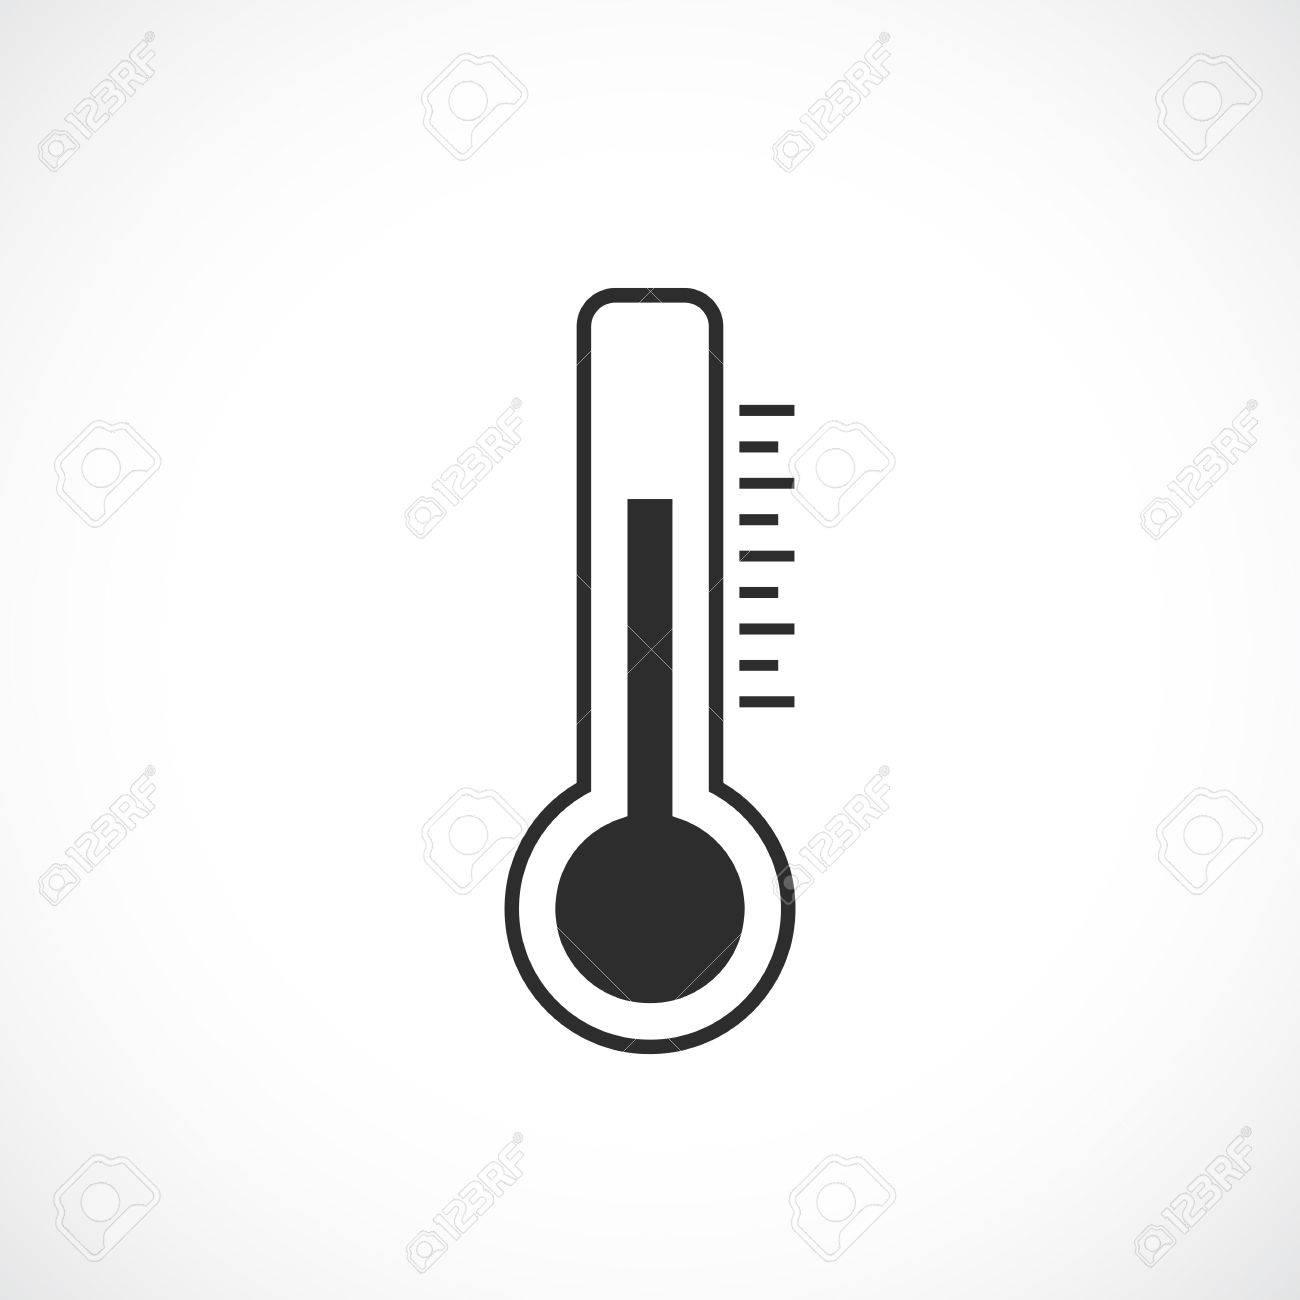 Thermometer Vector Pictogram Royalty Free Cliparts Vectors And Stock Illustration Image 73972534 Higrometro termometro digital medicion humedad y temperatura. thermometer vector pictogram